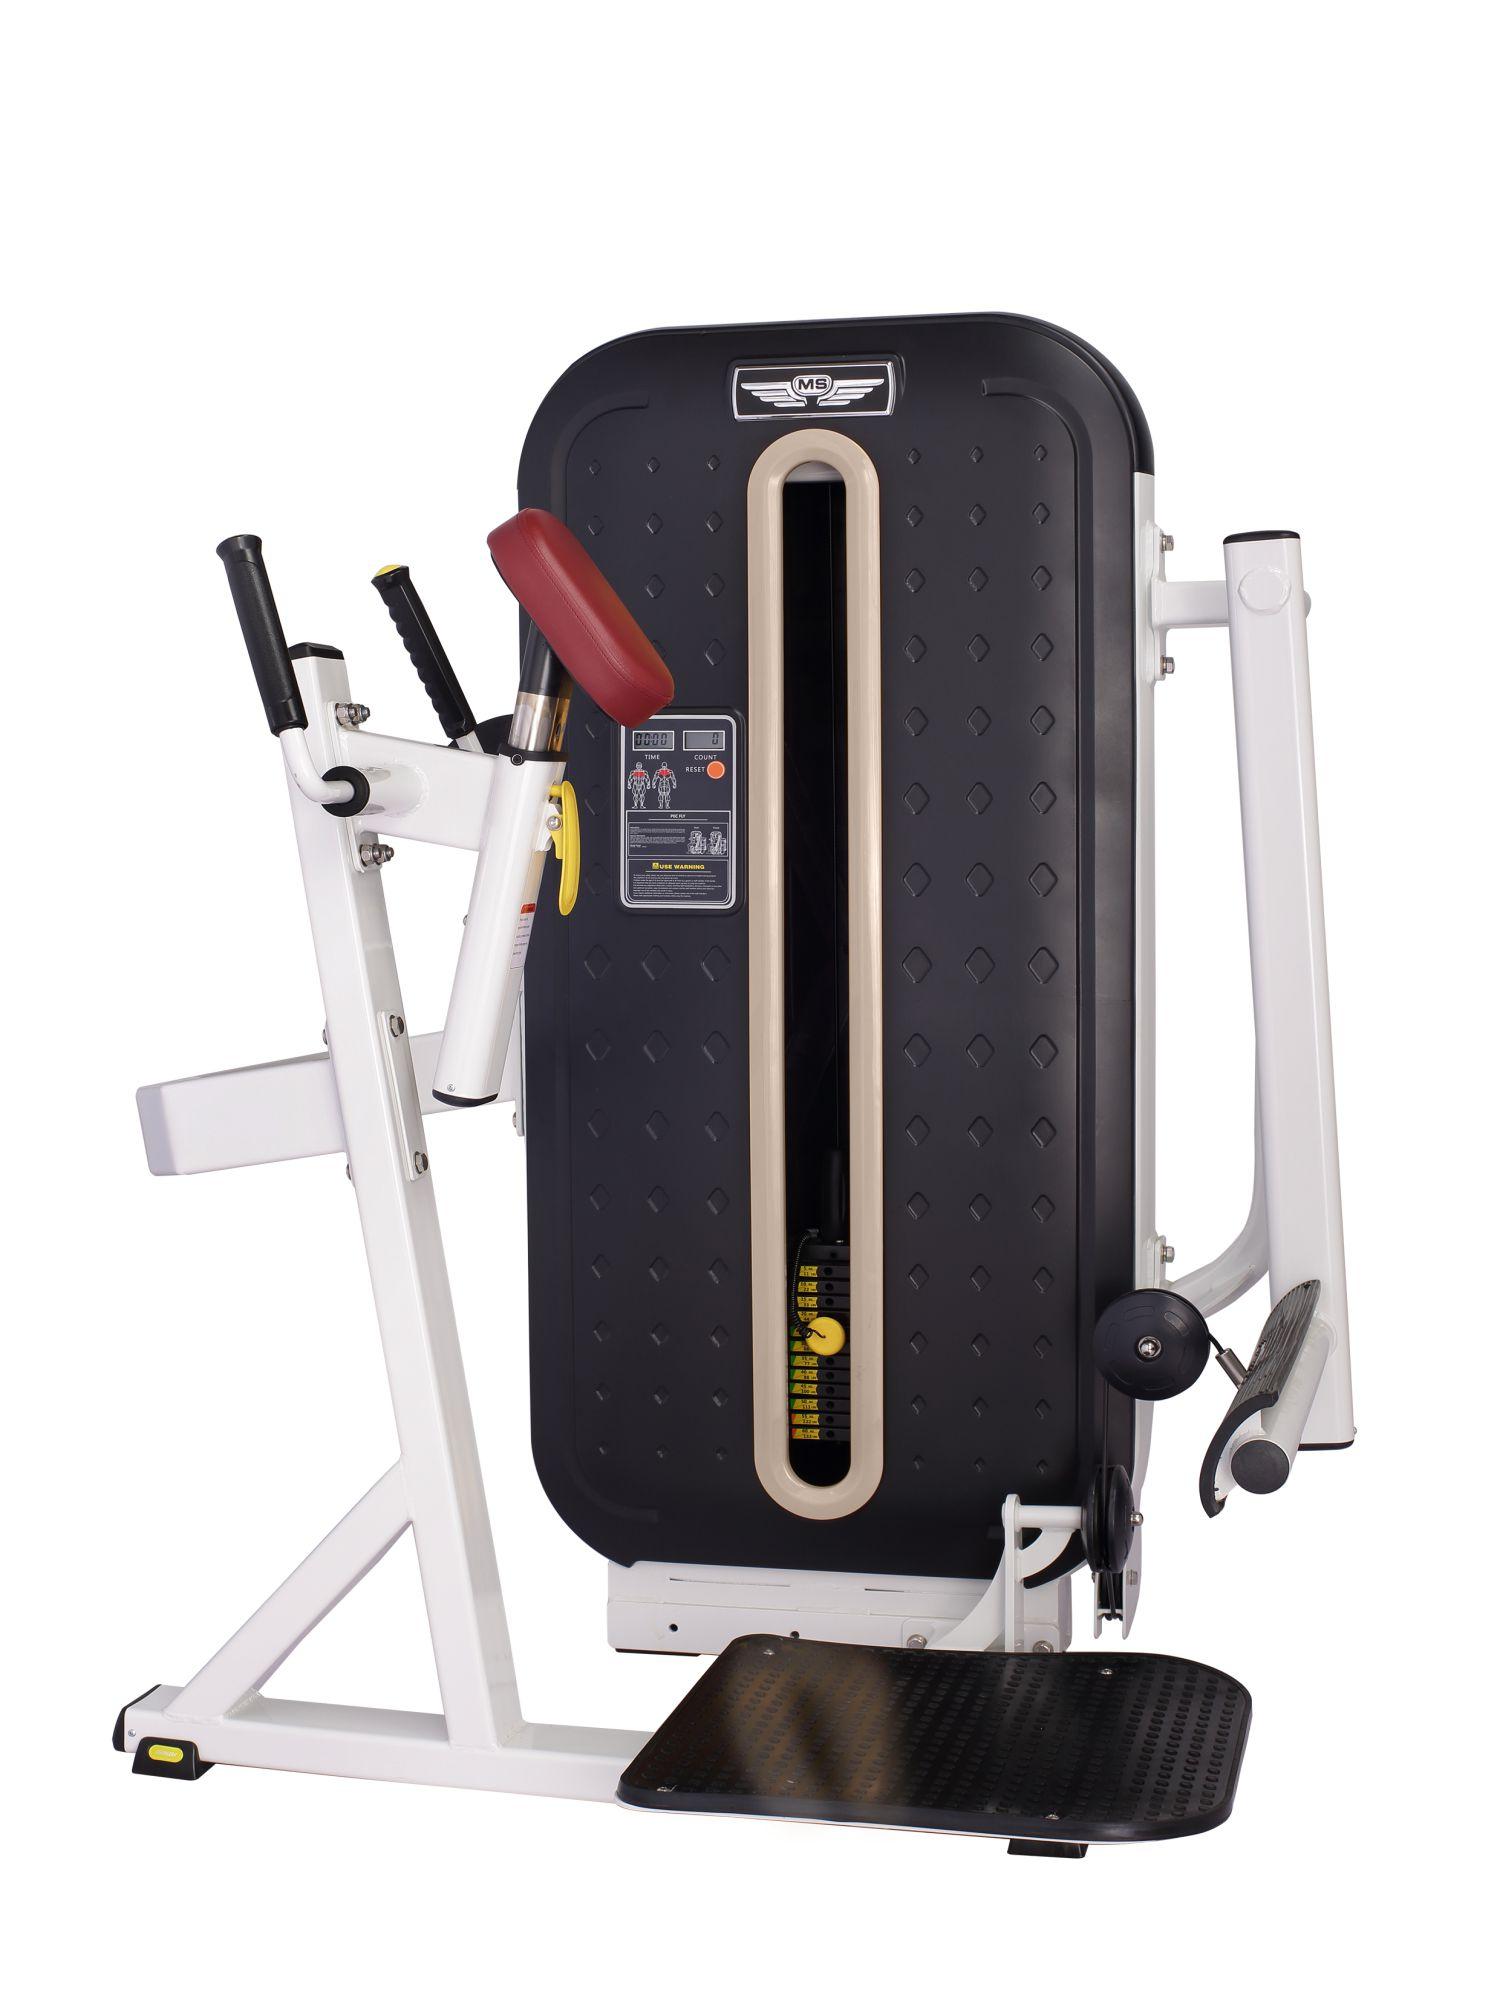 Máy đạp mông KickBack MS FITNESS M8F-016A